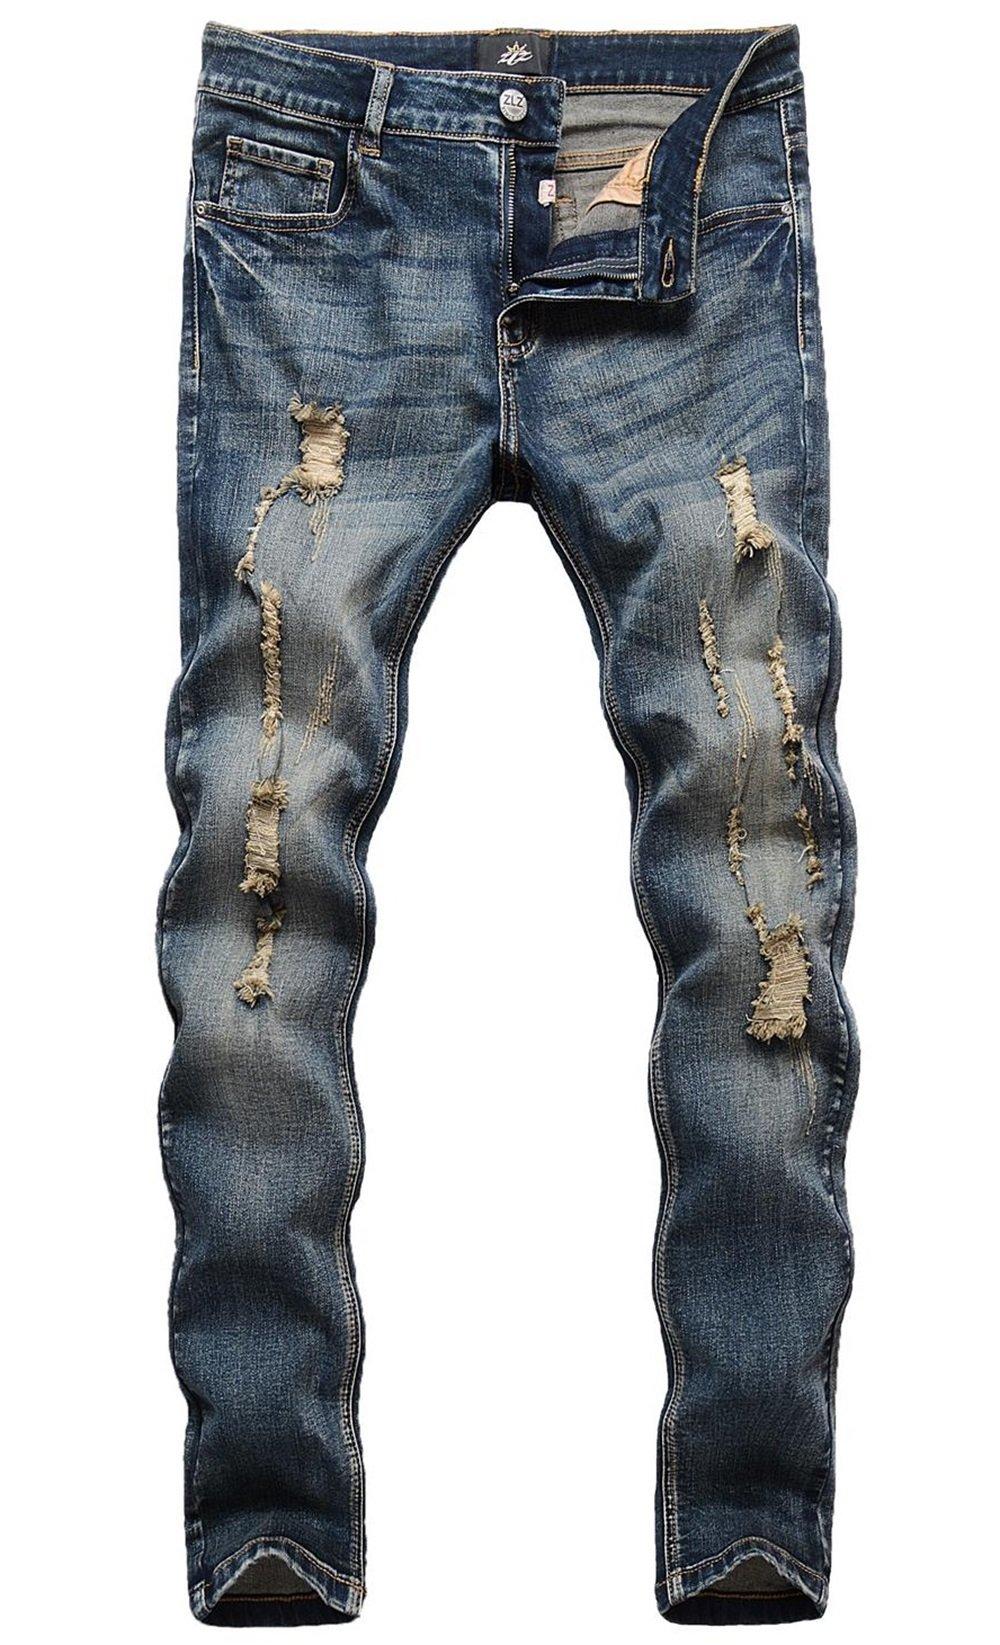 ZLZ Men's Ripped Skinny Distressed Destroyed Slim Fit Stretch Biker Jeans Pants With Holes, Vintage Blue, 32